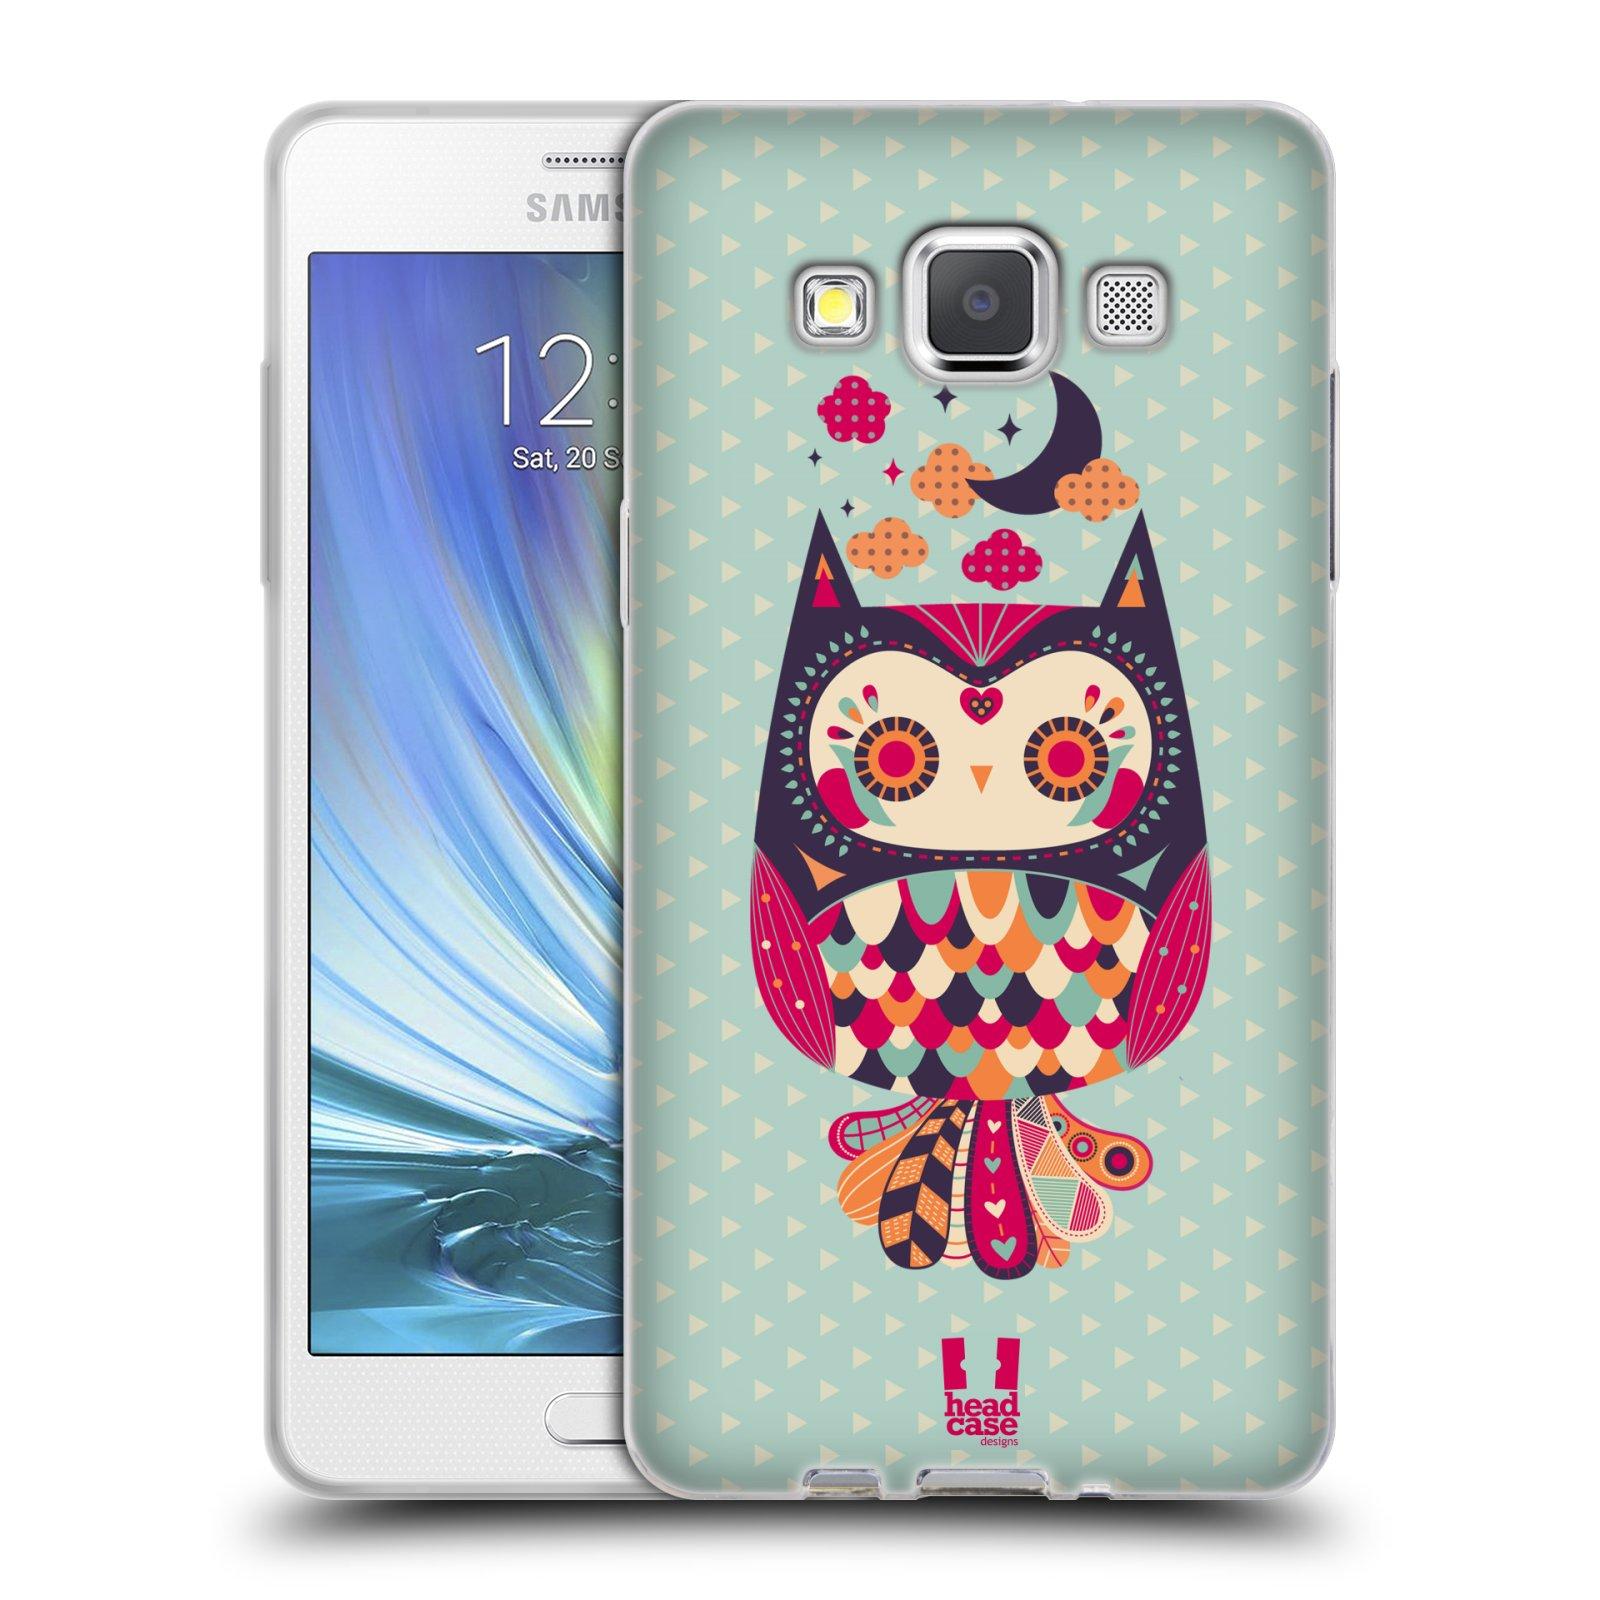 HEAD CASE silikonový obal na mobil Samsung Galaxy A5 vzor Stmívání sovička růžová a fialová